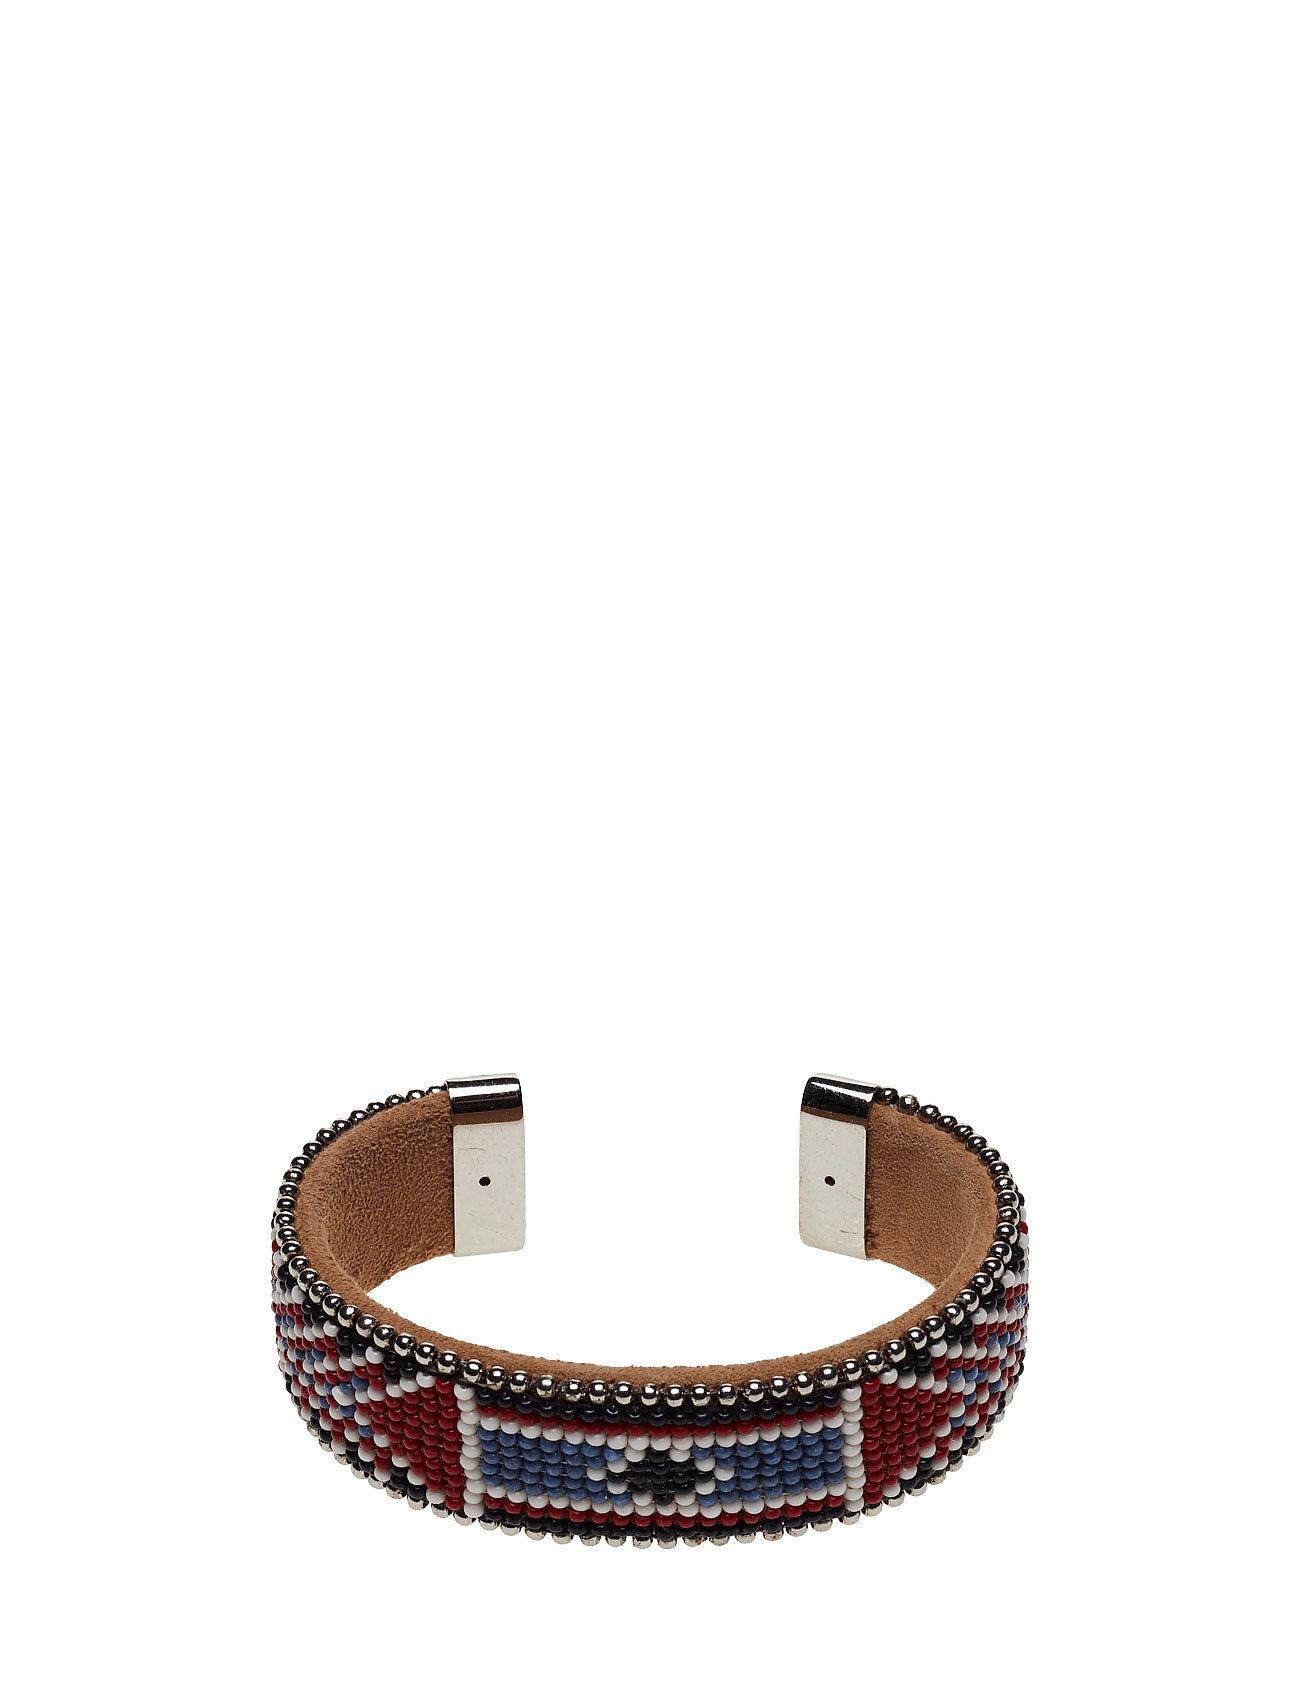 Hunkydory Naya Wide Beaded Cuff Accessories Jewellery Bracelets Bangles Monivärinen/Kuvioitu Hunkydory